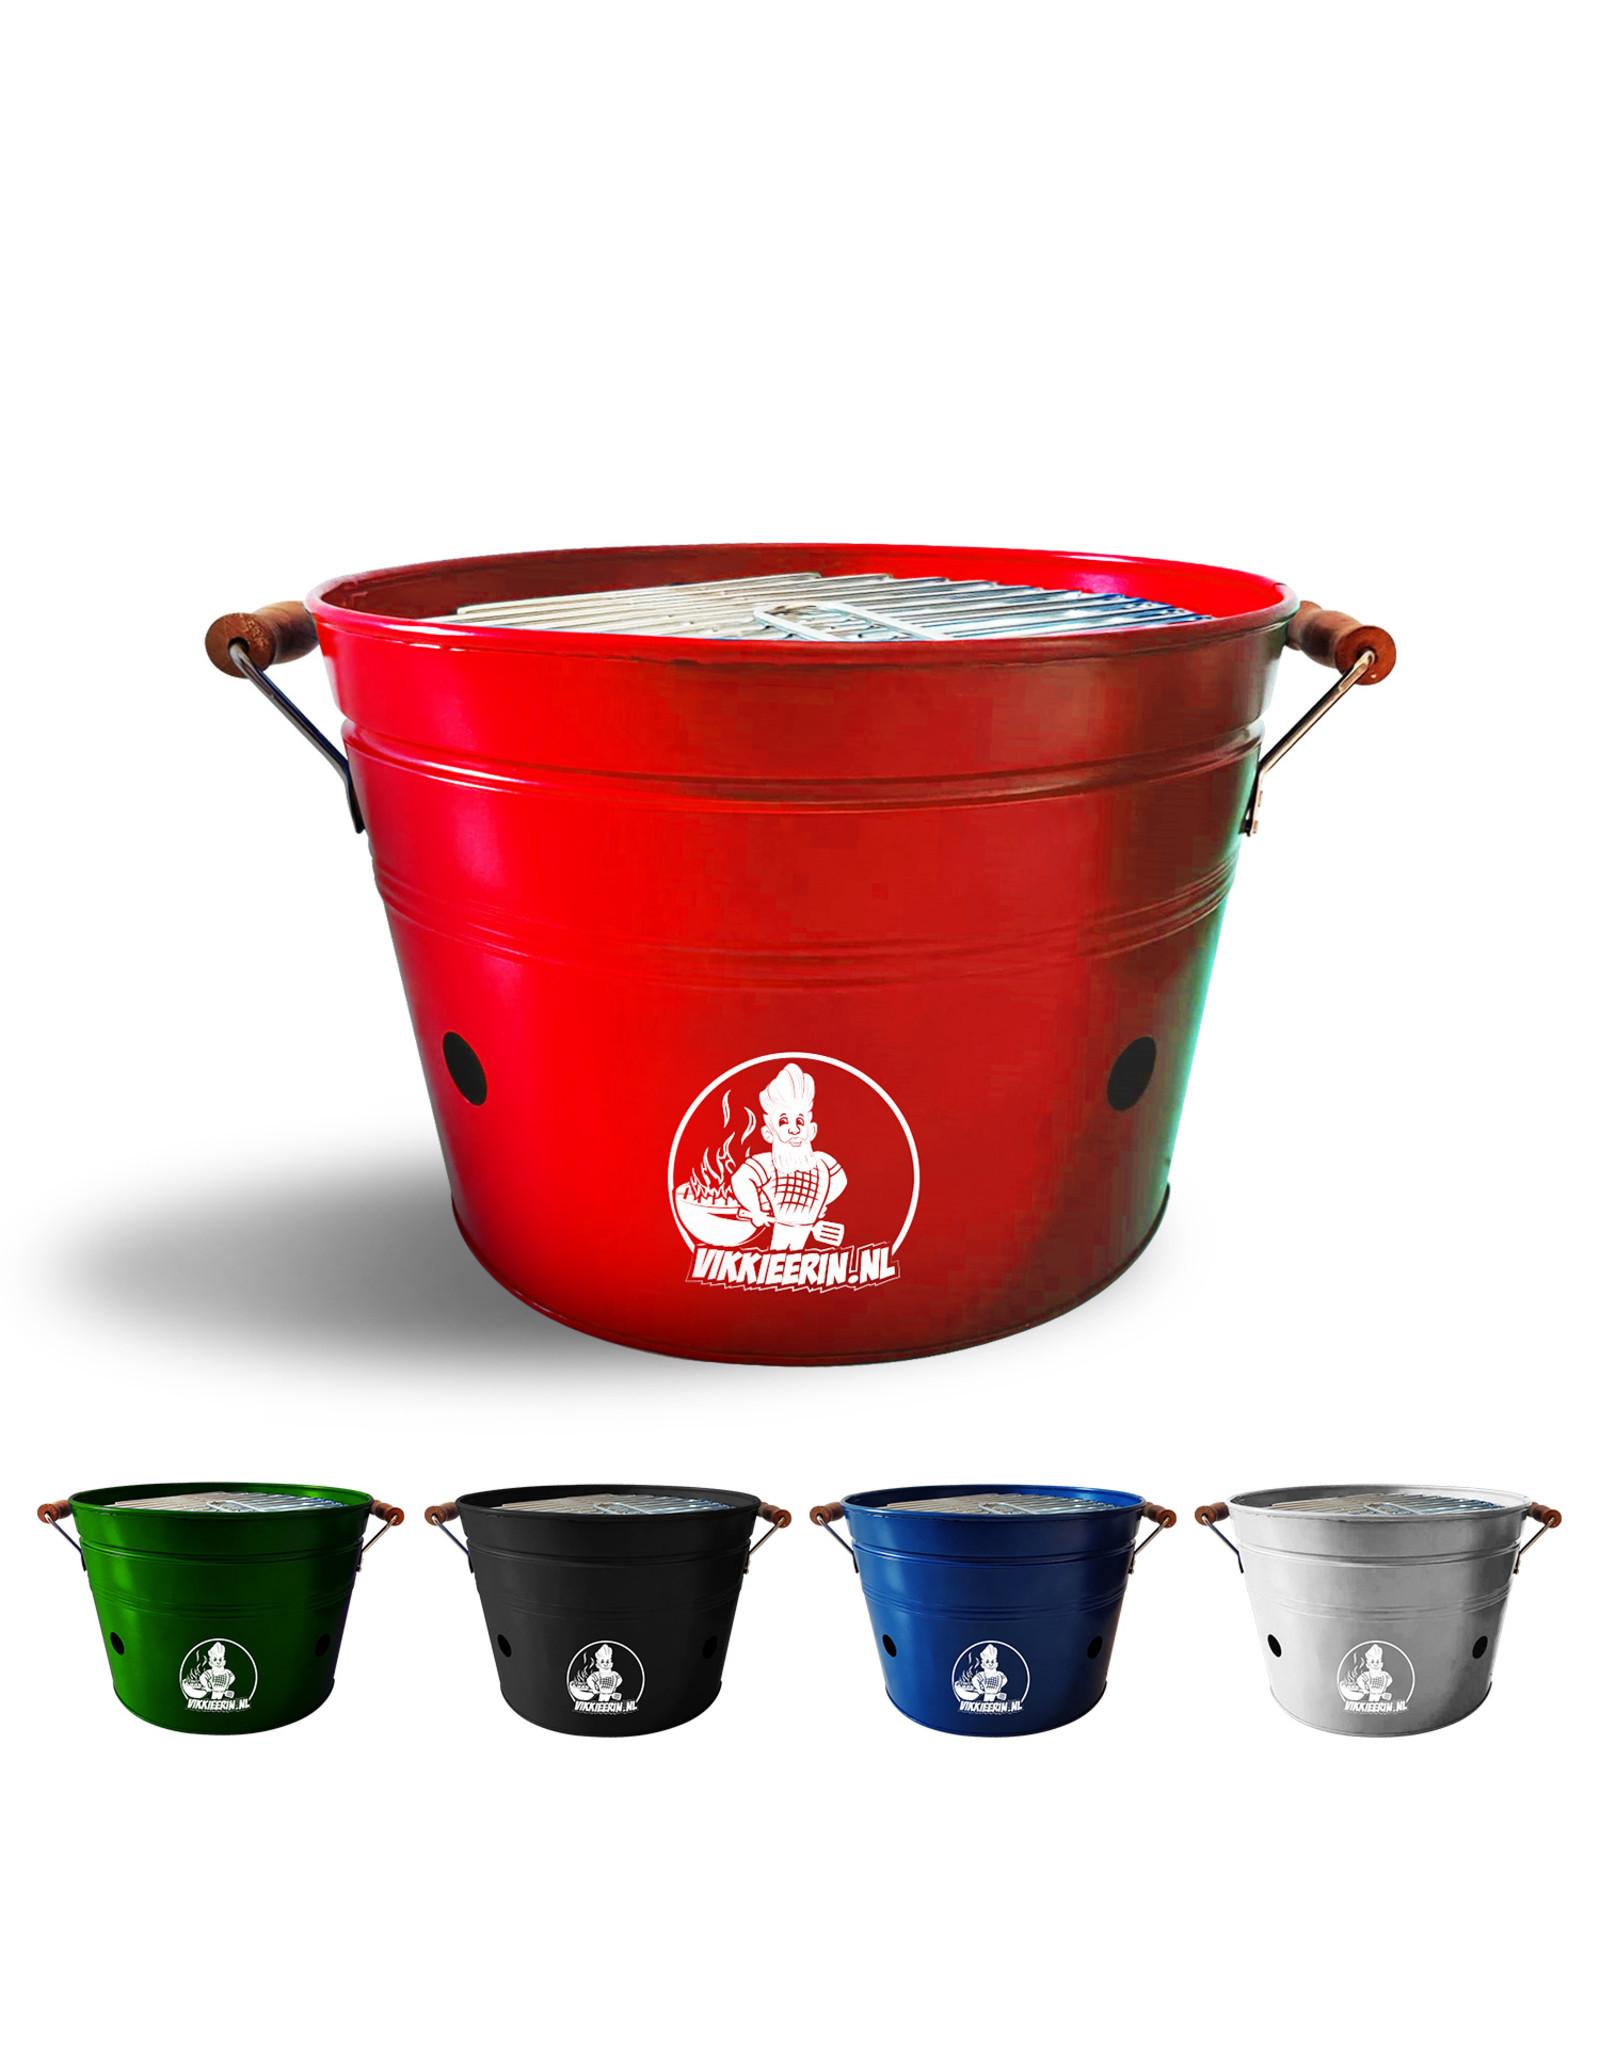 VIKKIEERIN.NL Vikkieerin.nl - Large Portable Charcoal Bucket BBQ - round - red - Ø38 cm